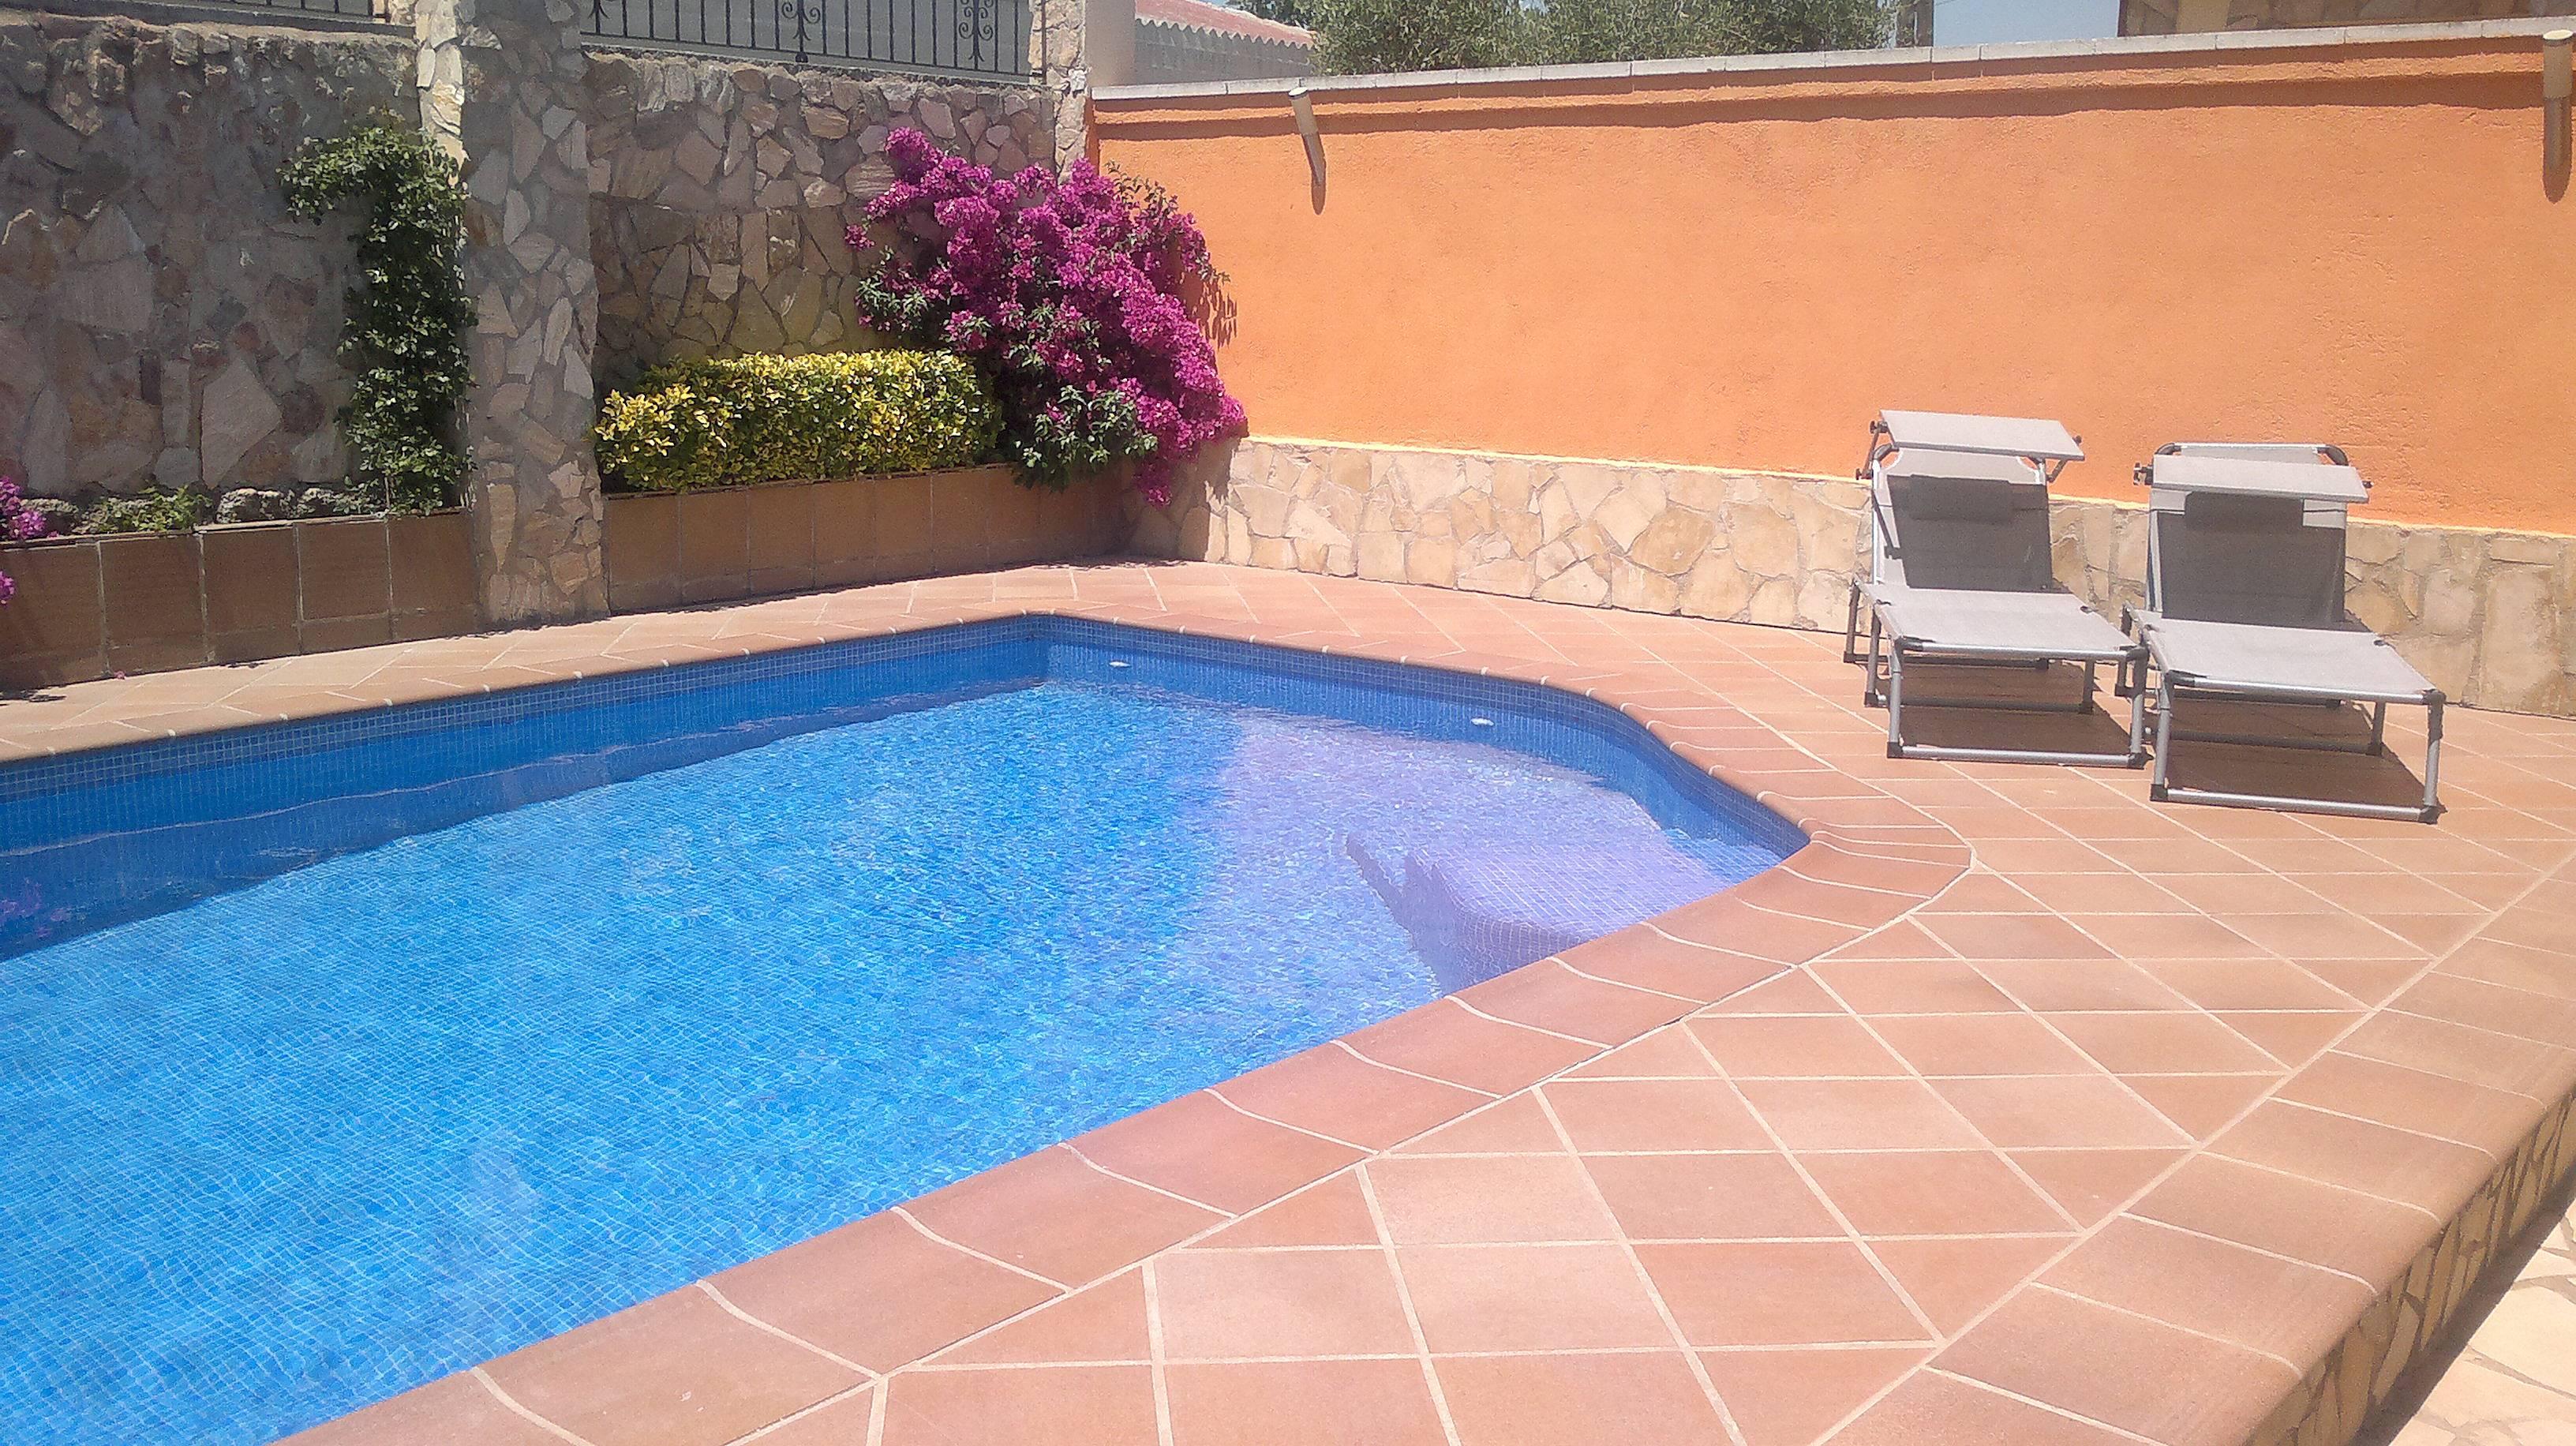 Casa familiar con piscina lloret de mar girona gerona for Piscina lloret